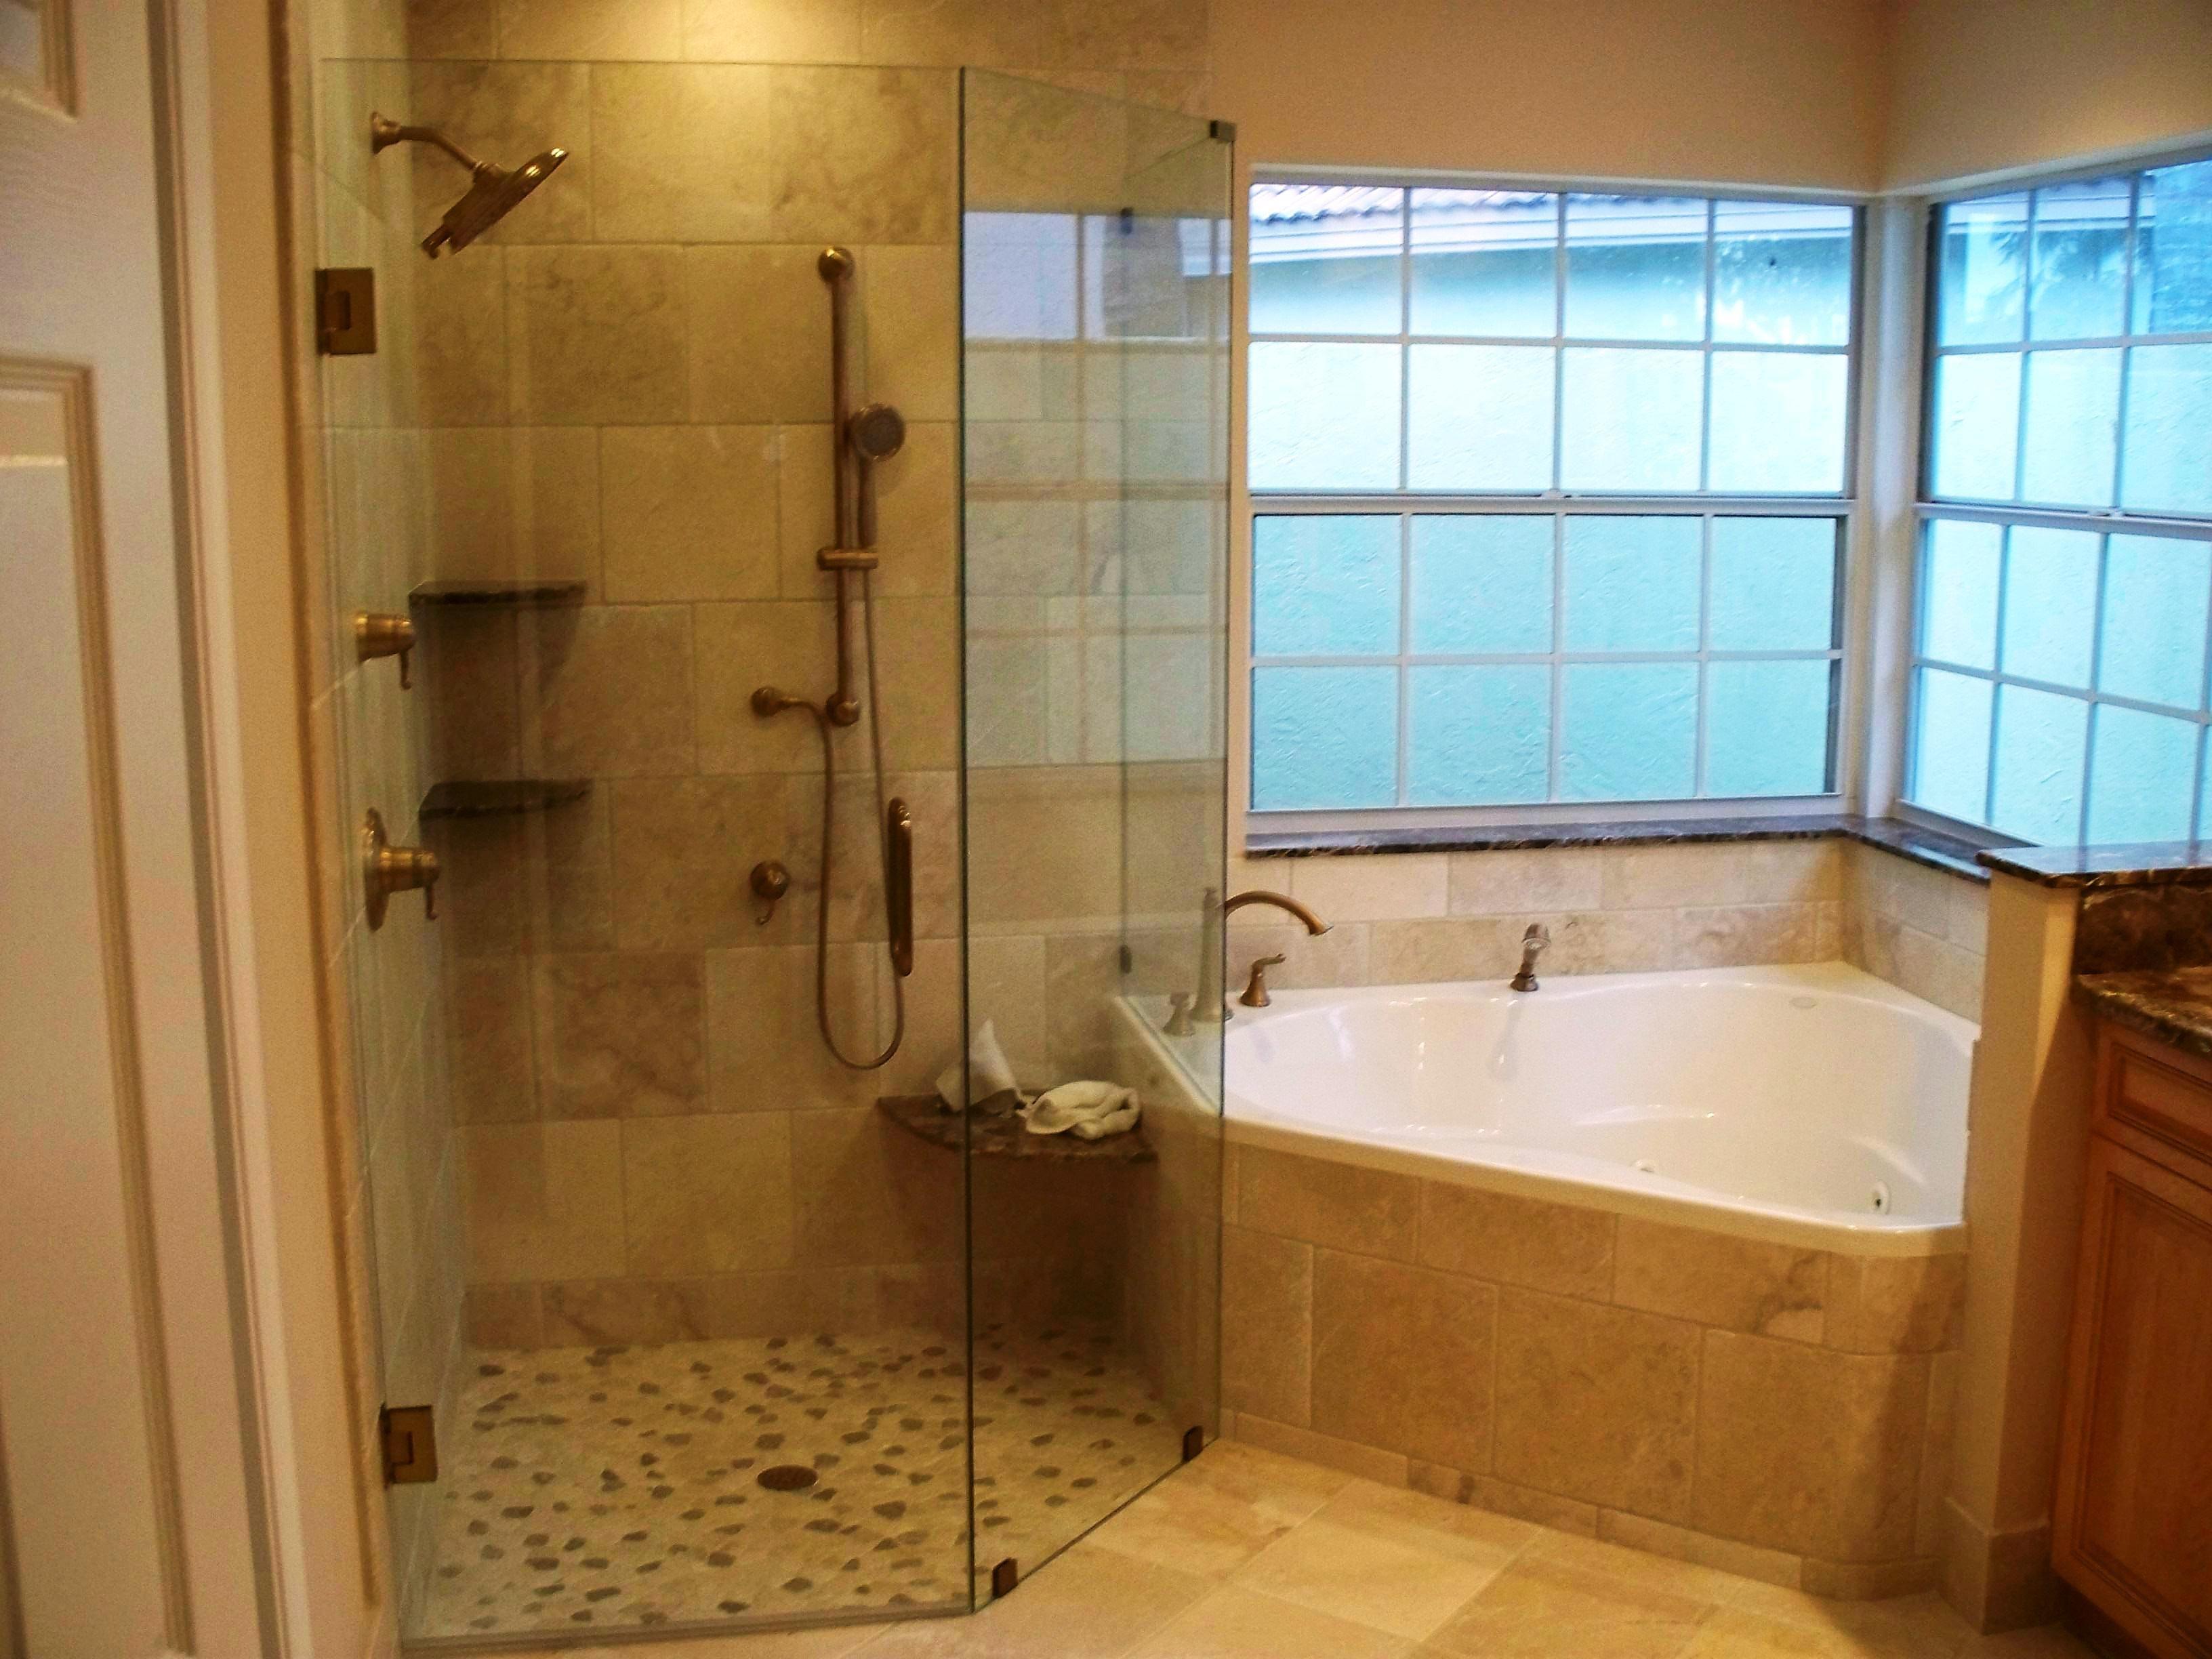 Corner Bathtub Shower Combo Ideas In 2020 Jet Tub Shower Combo